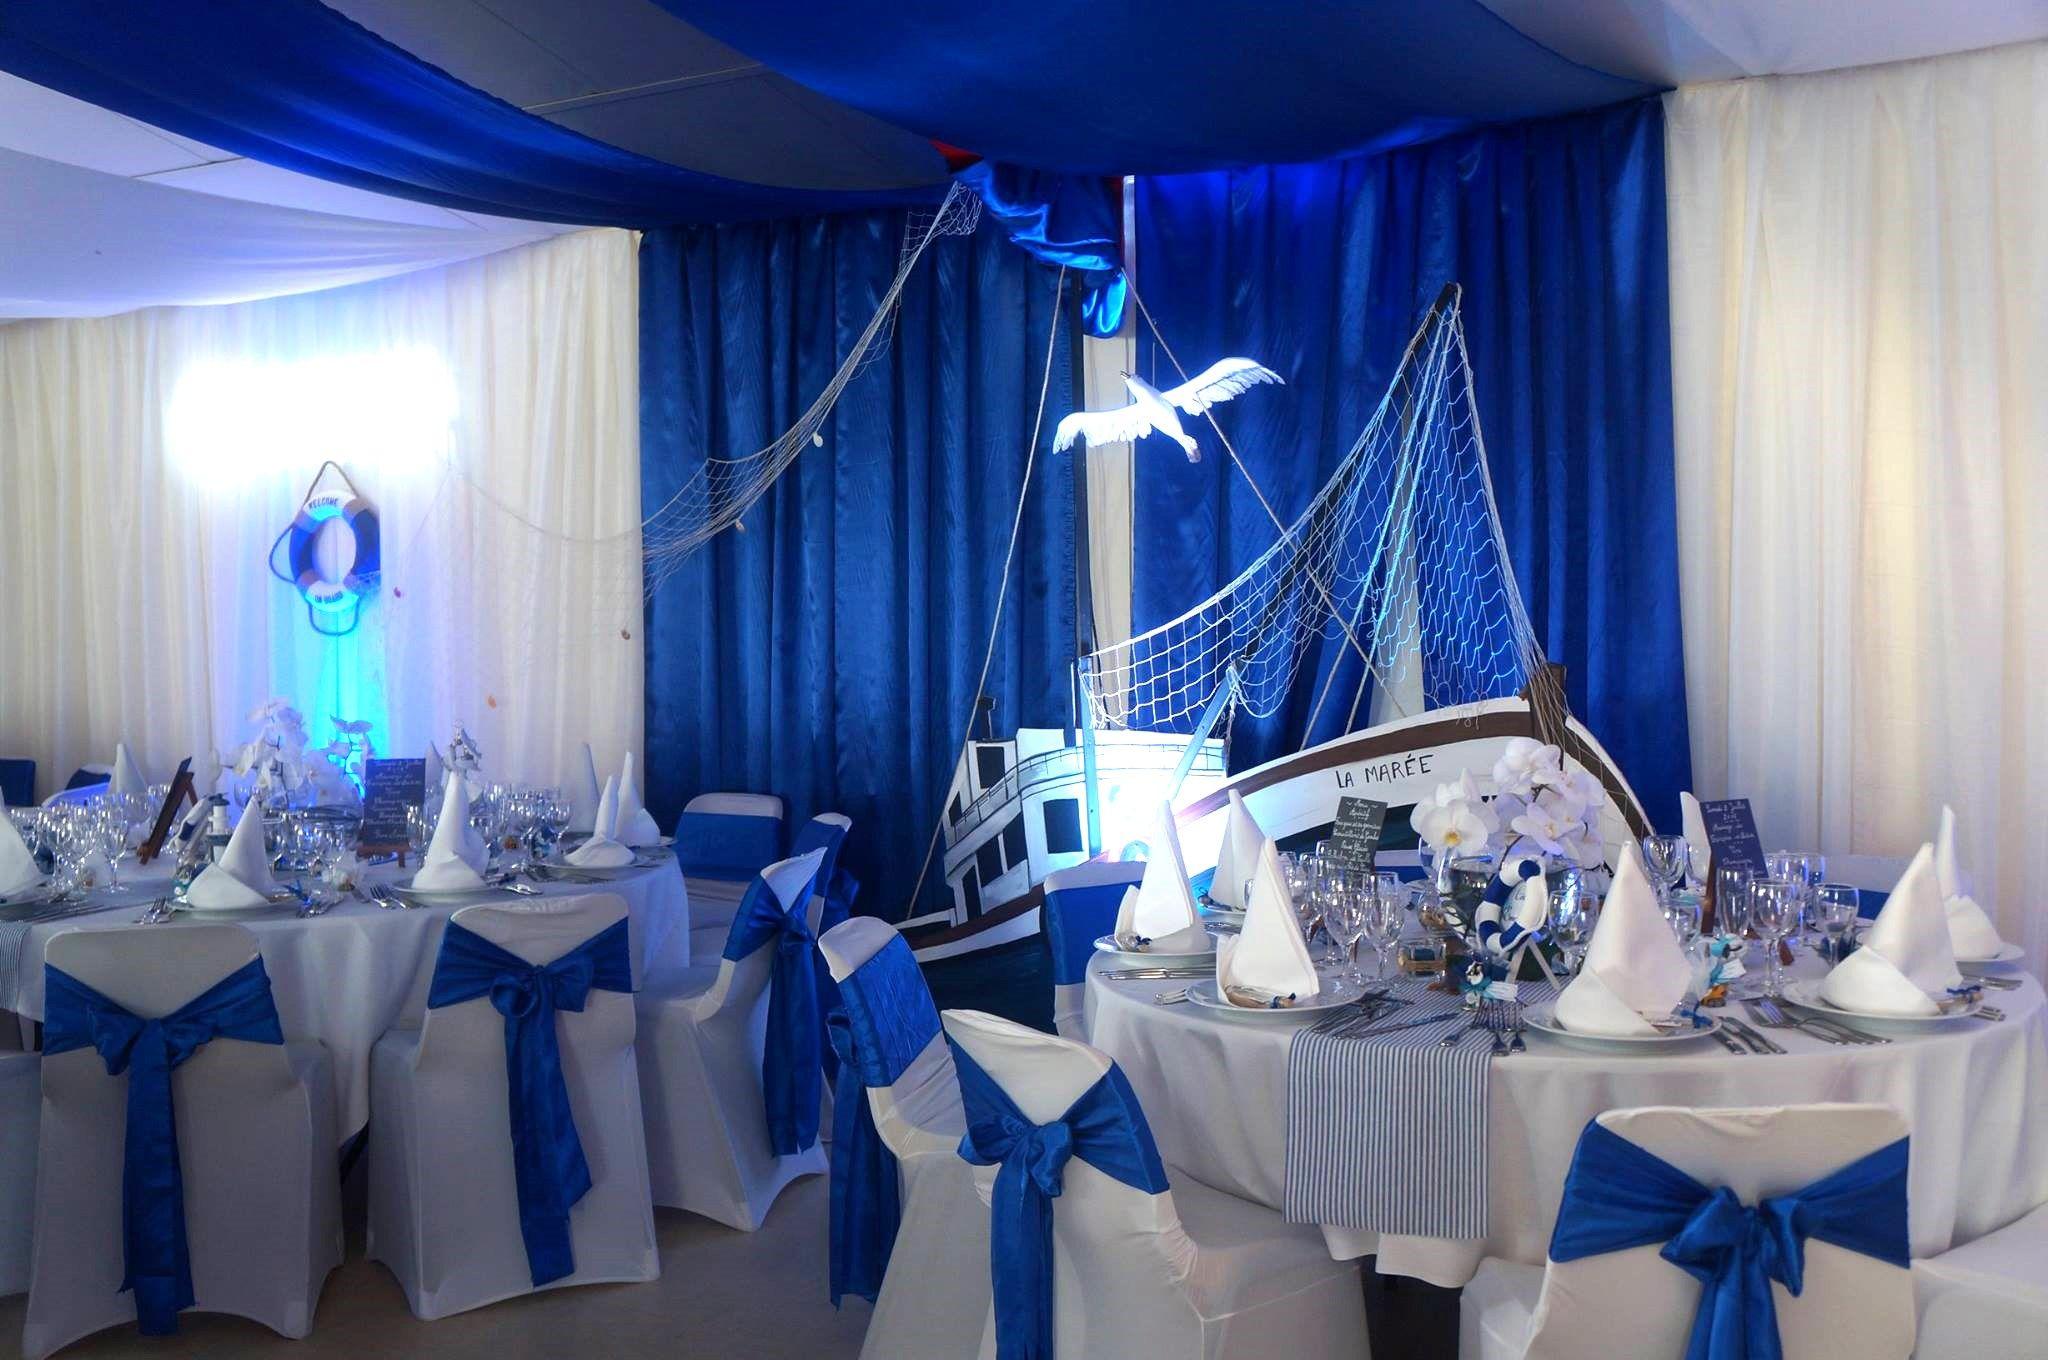 DECORATION MARIAGE THEME MER MARIN | Decoratrice mariage festidomi